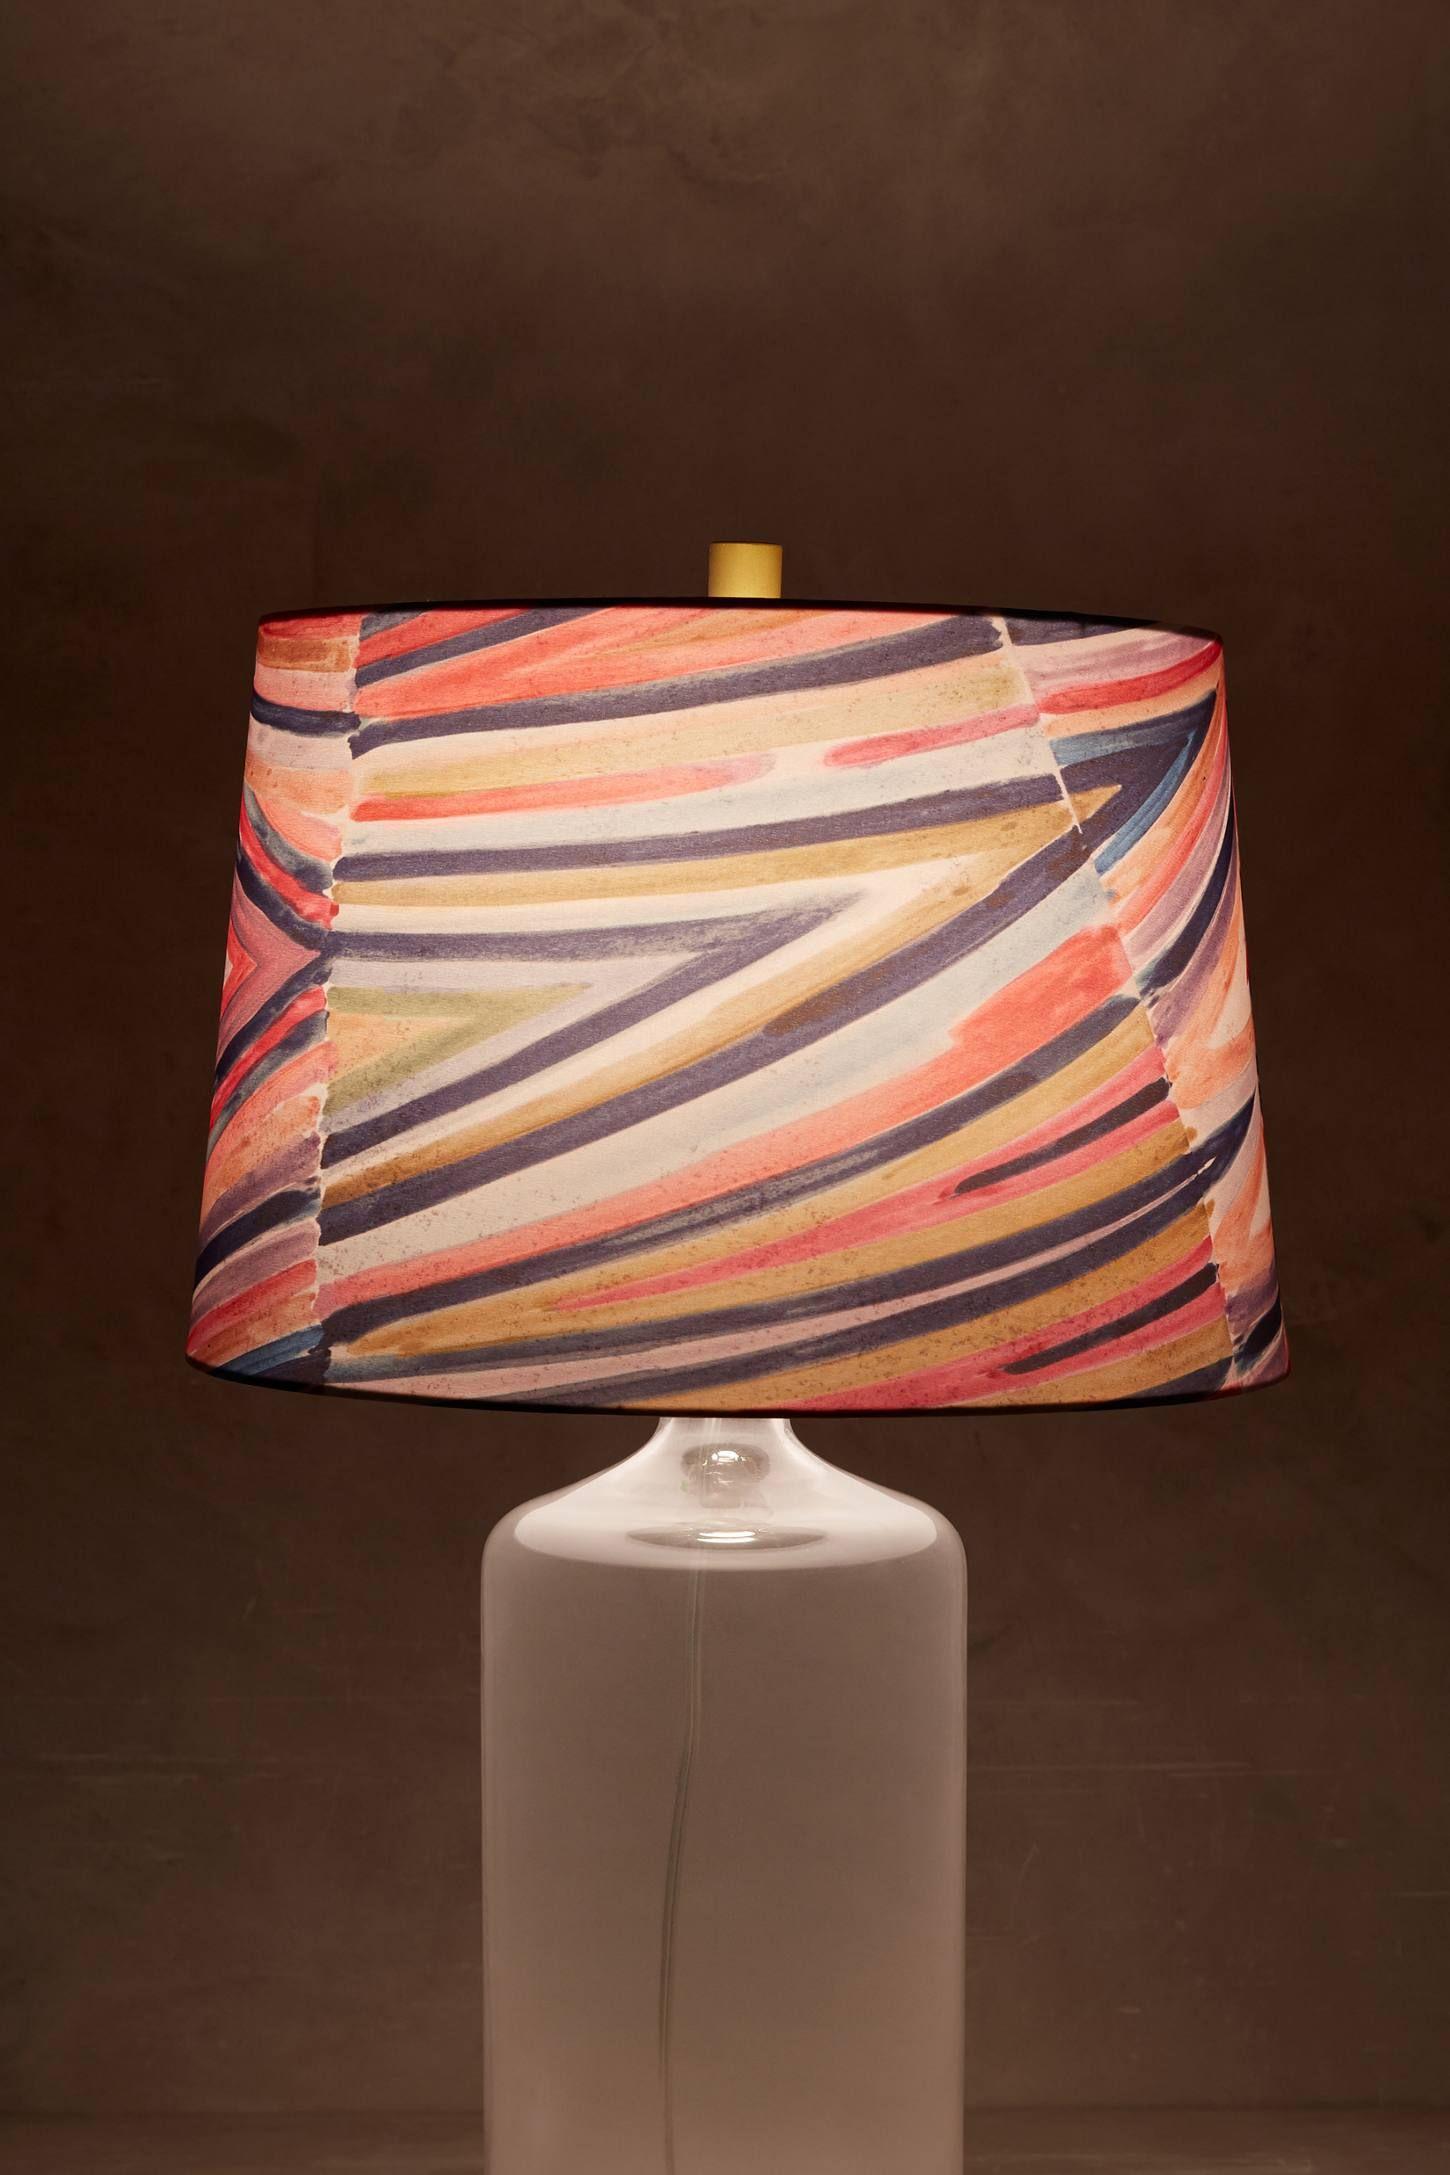 Medina Lamp Shade Lamp shade, Lamp, Shades